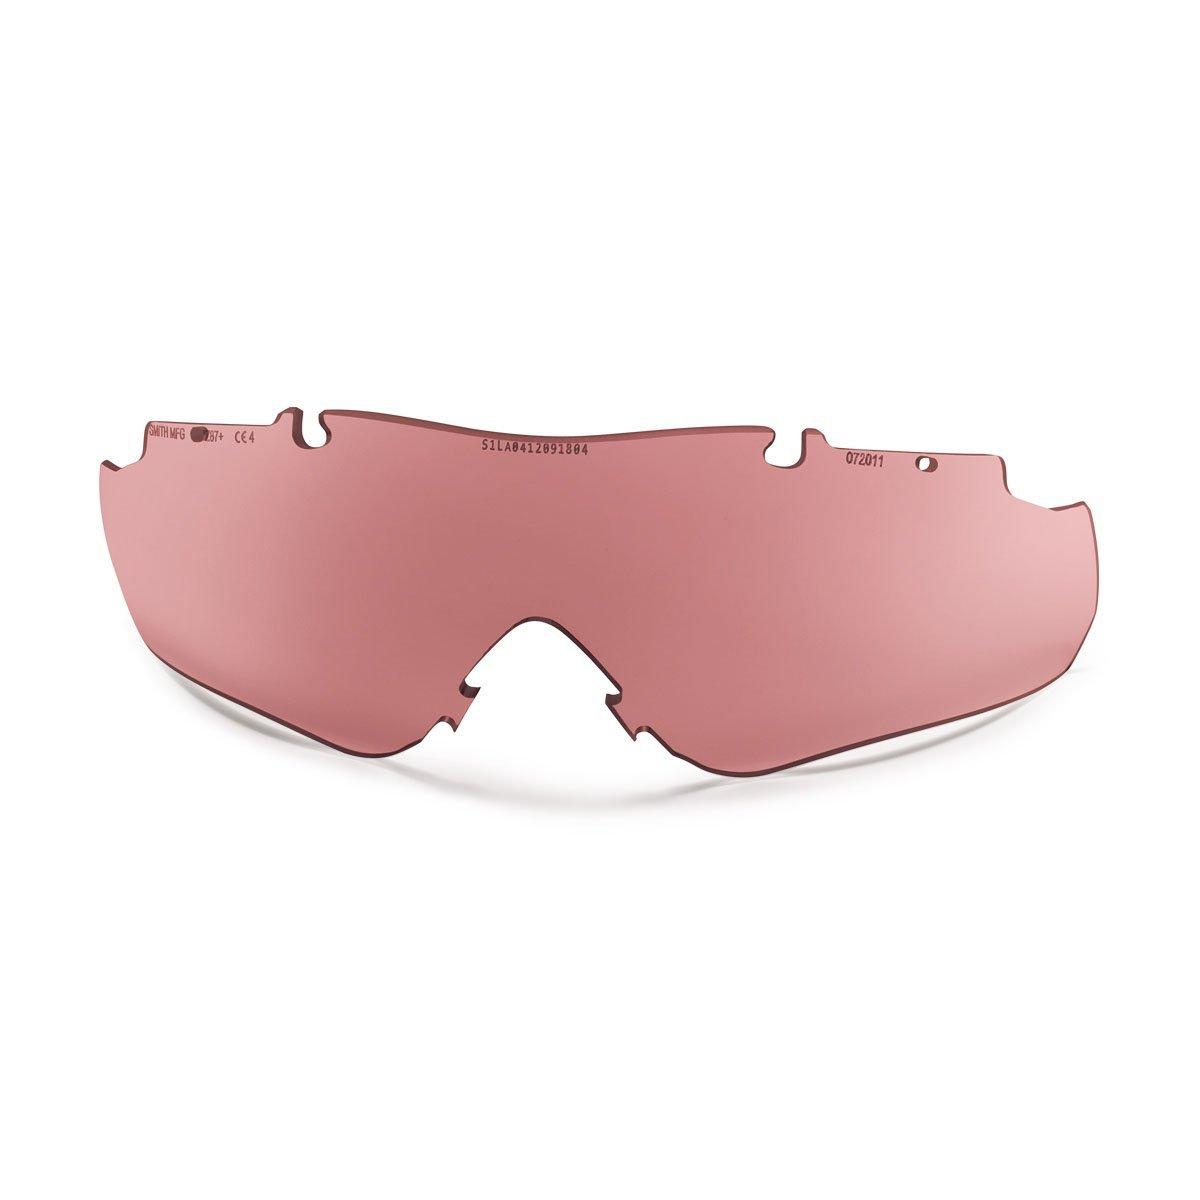 b5e154600a Elite Smith Optics Aegis Arc Echo Echo II Compact Tactical Eyeshield  Replacement Lens